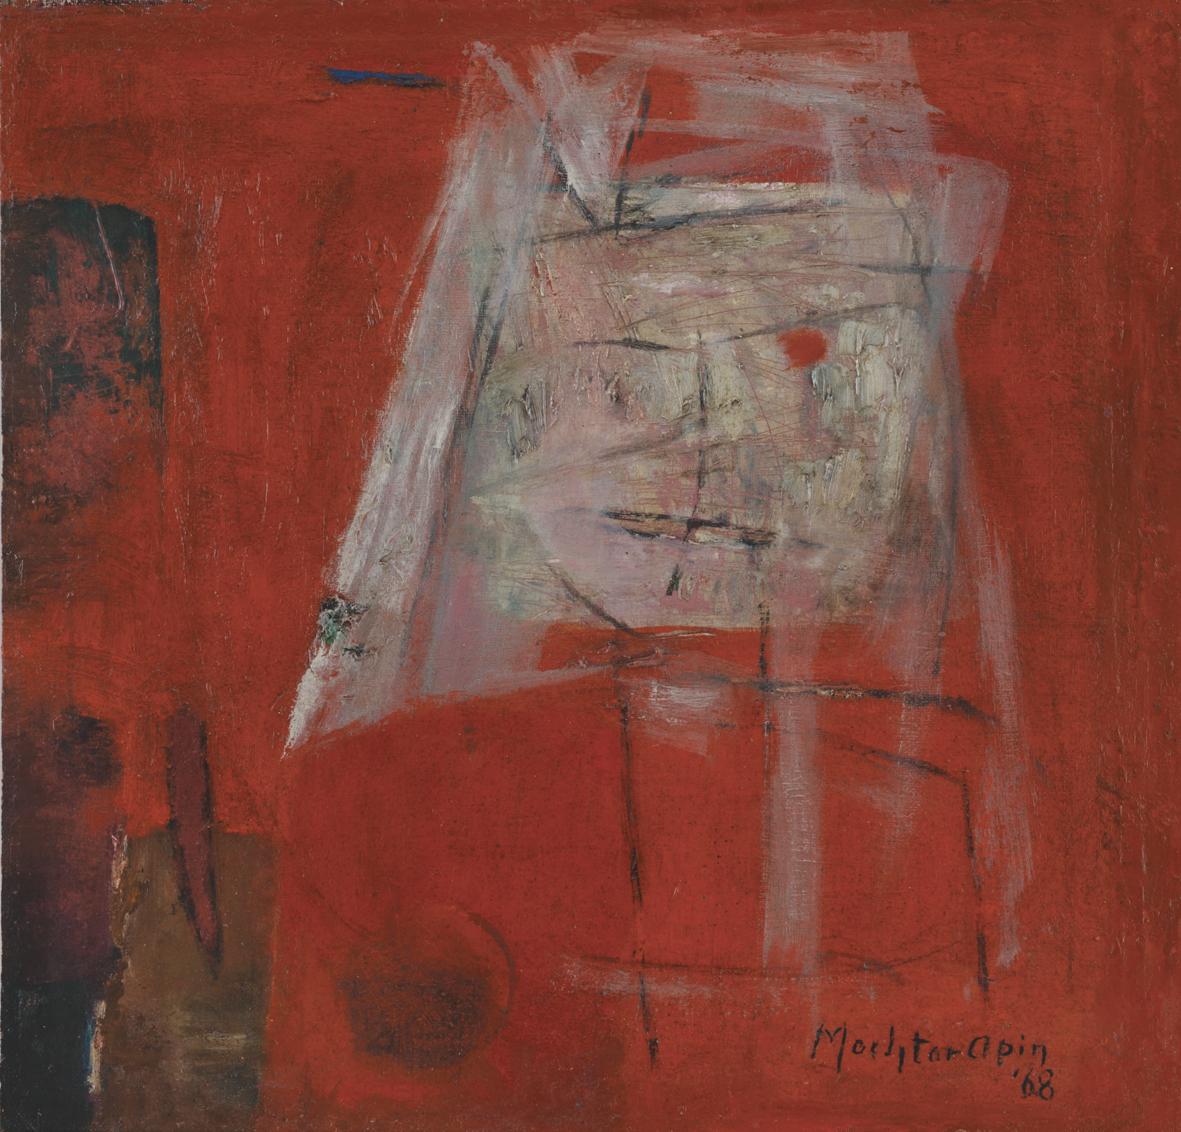 Mochtar Apin, Abstract Face, ooc, 33 x 33 cm, 1968.jpg